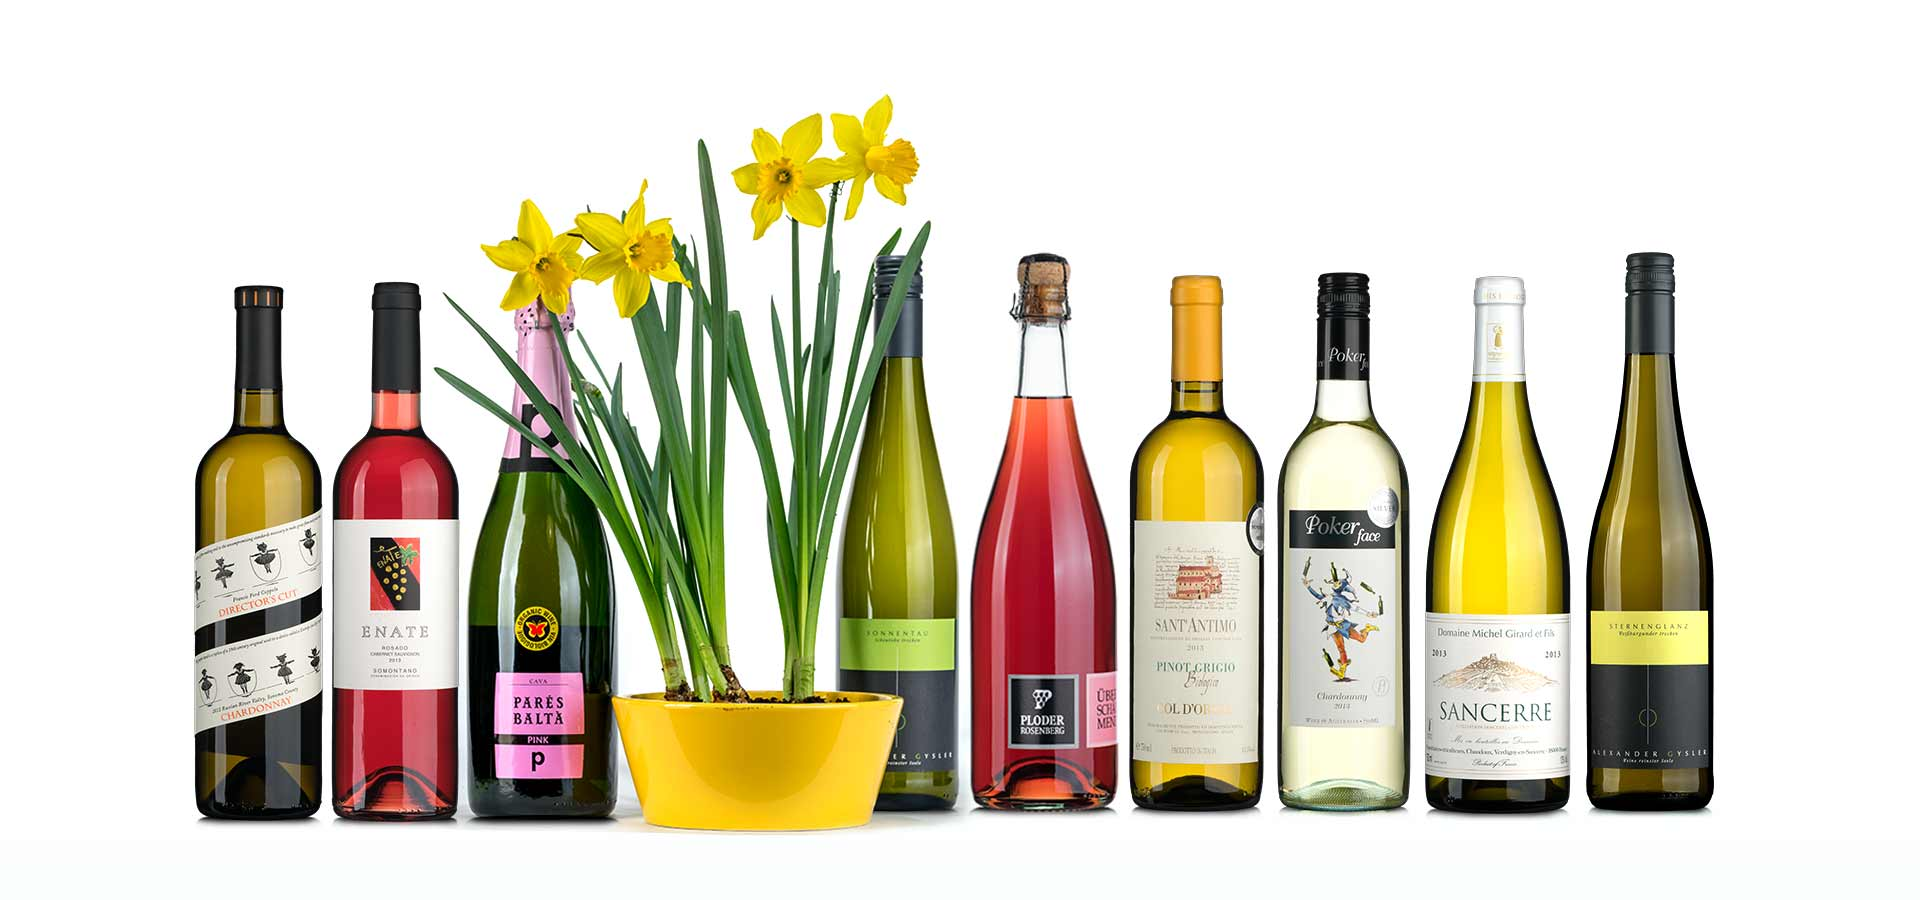 fruehlingswein-2019-bei-vinoakvo